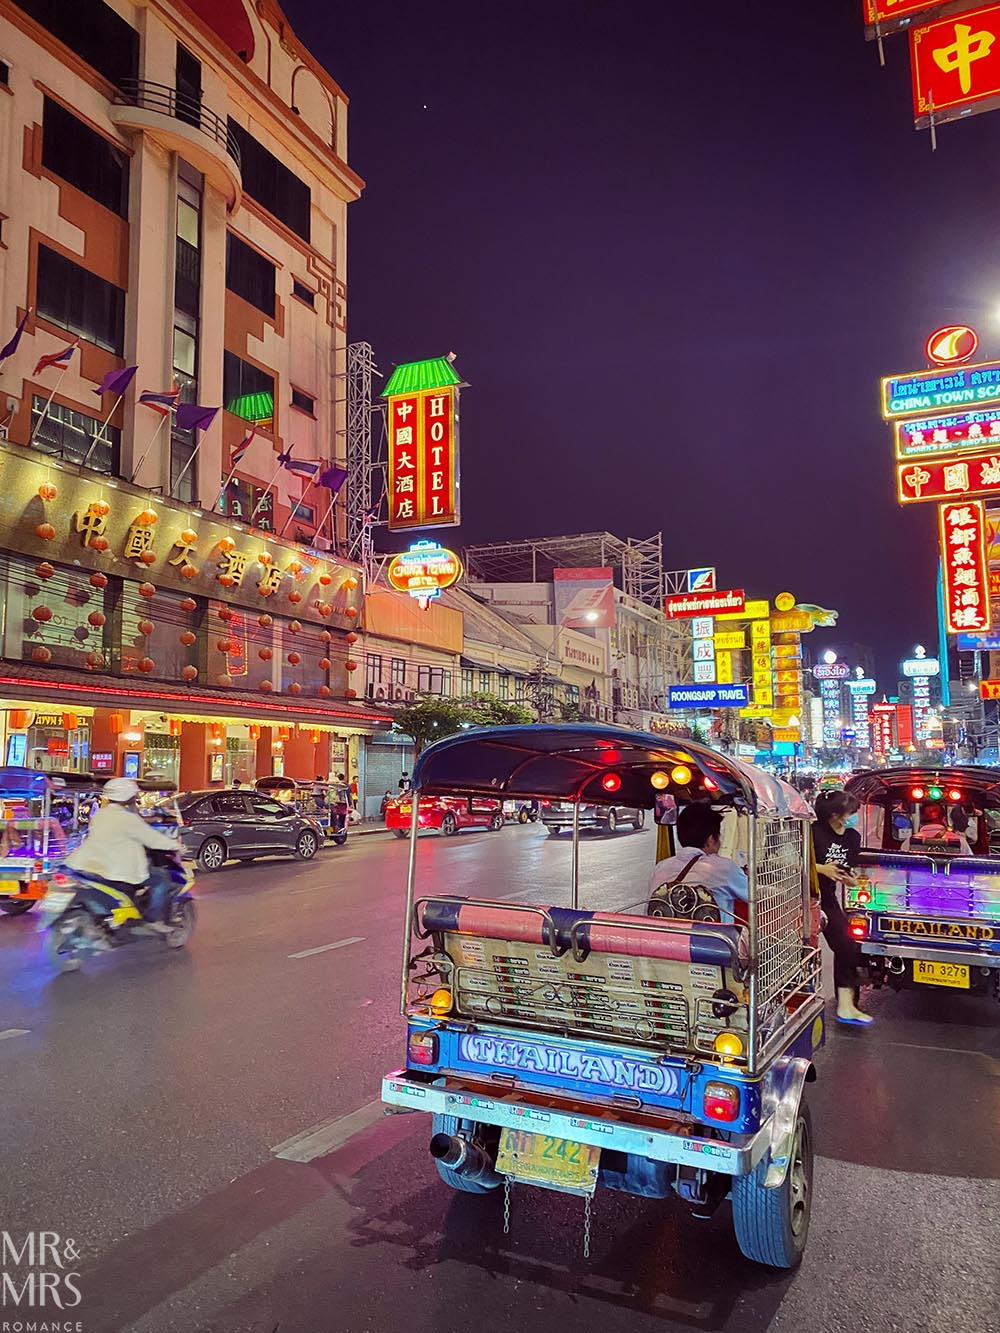 Yoawarat - Bangkok Chinatown. What it's like on the Dragon Road